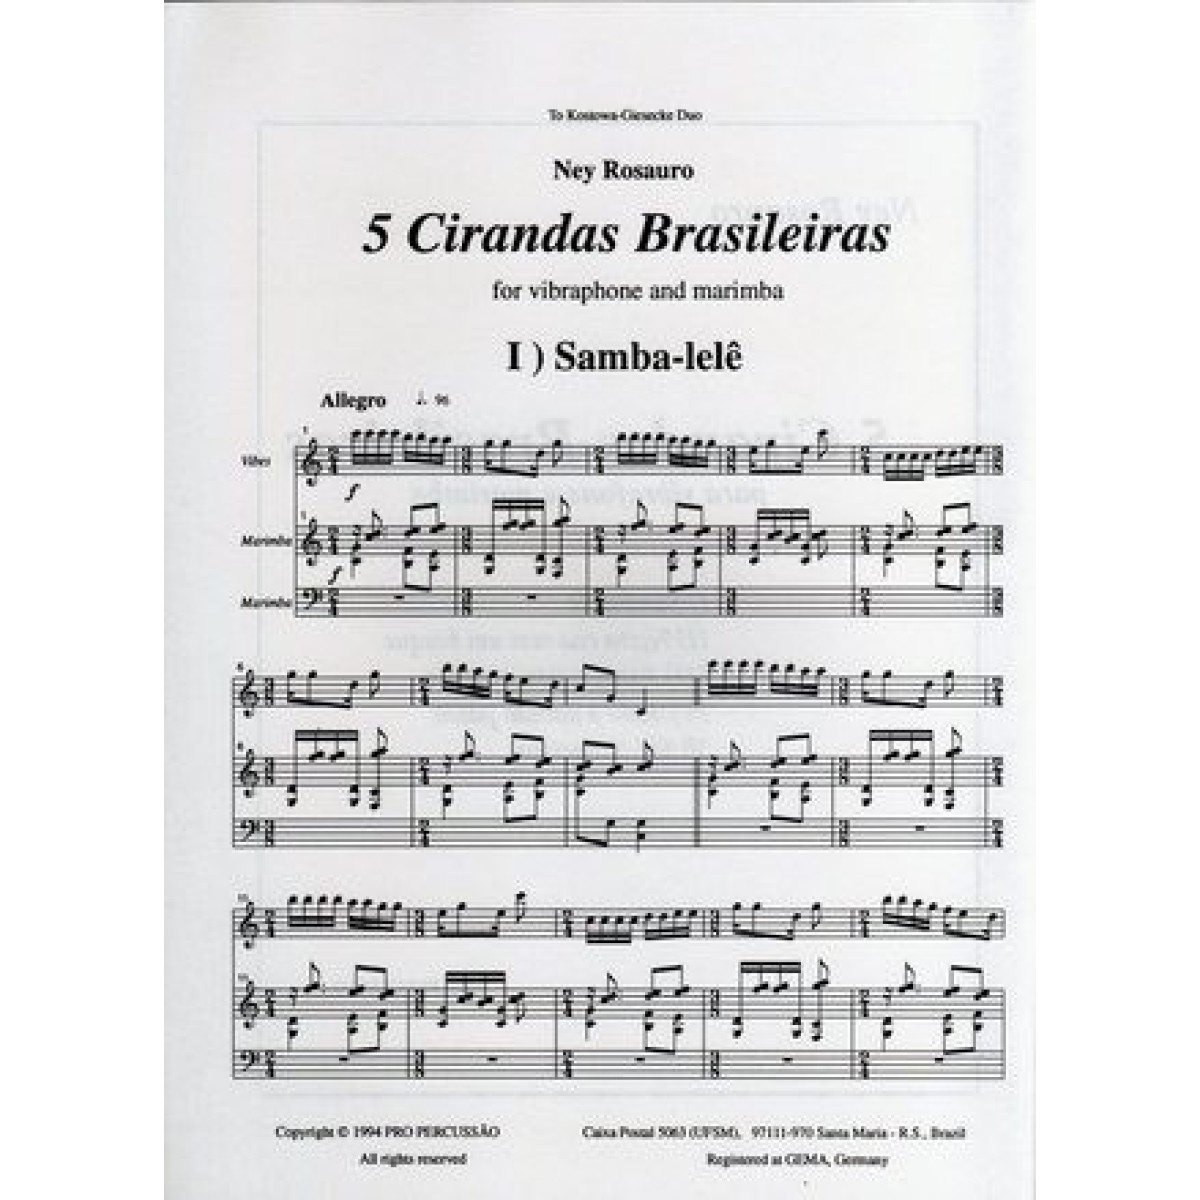 5 Cirandas by Ney Rosauro